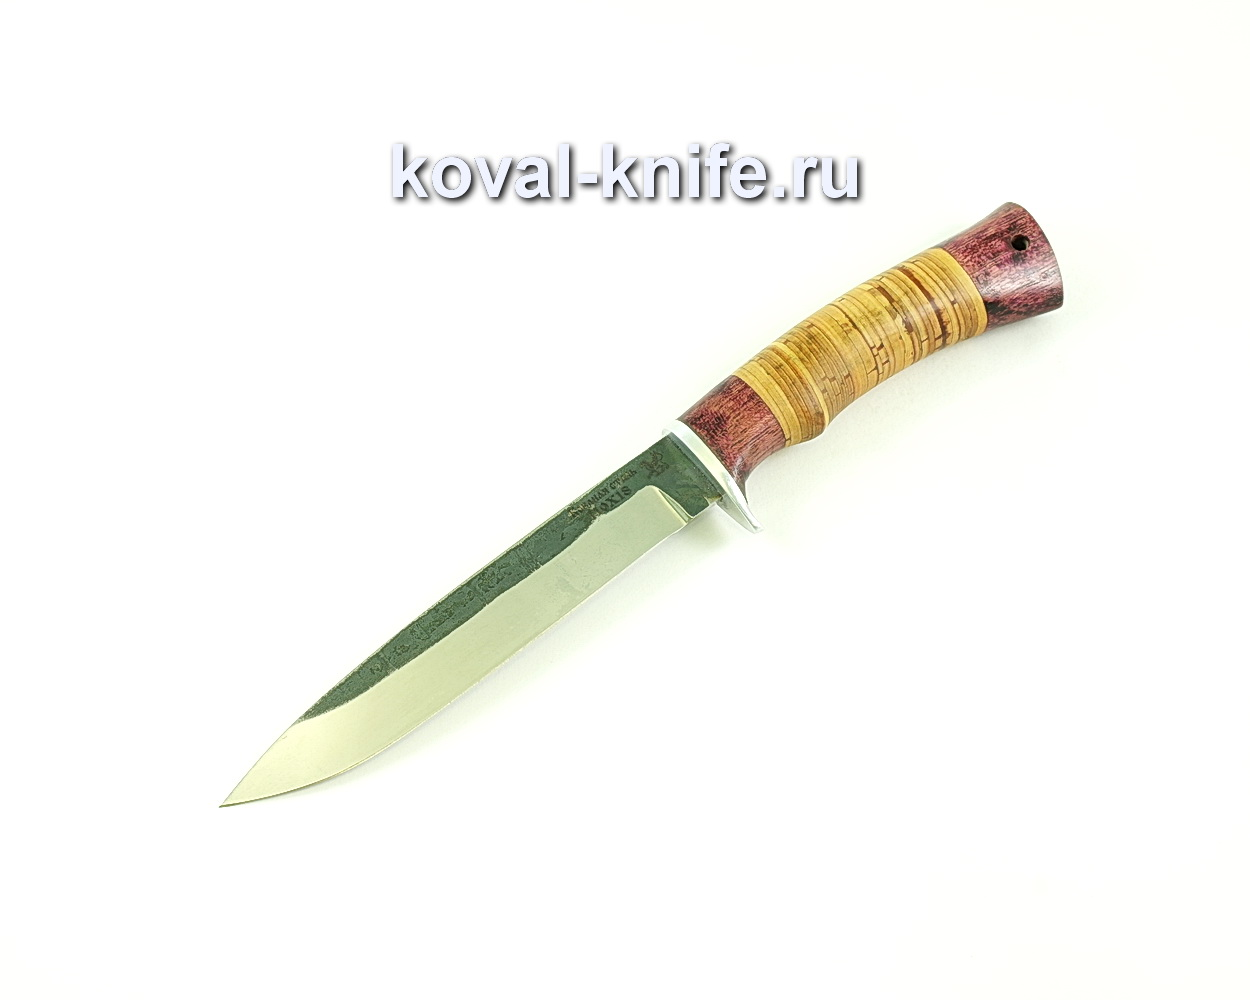 Нож Турист-3 (сталь 110х18), рукоять амарант, береста A150